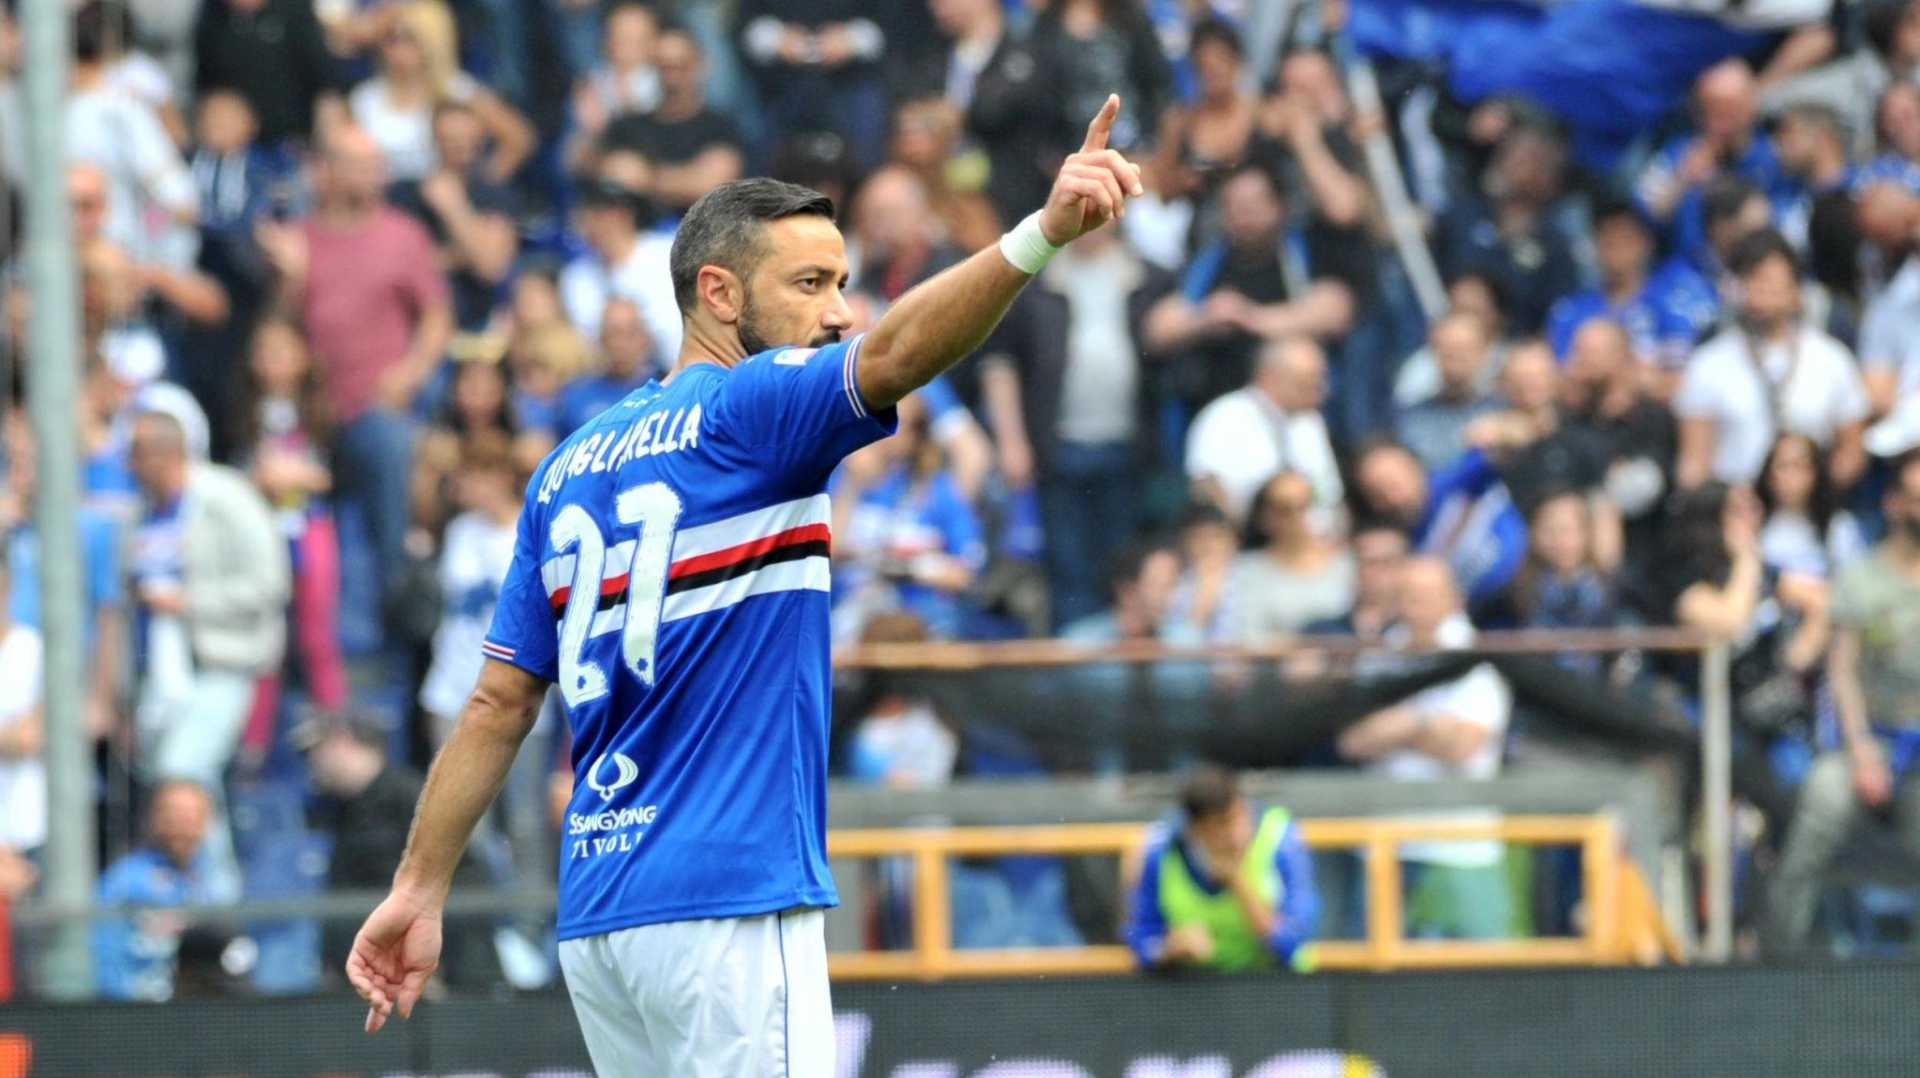 Serie A, Sampdoria: Quagliarella da record